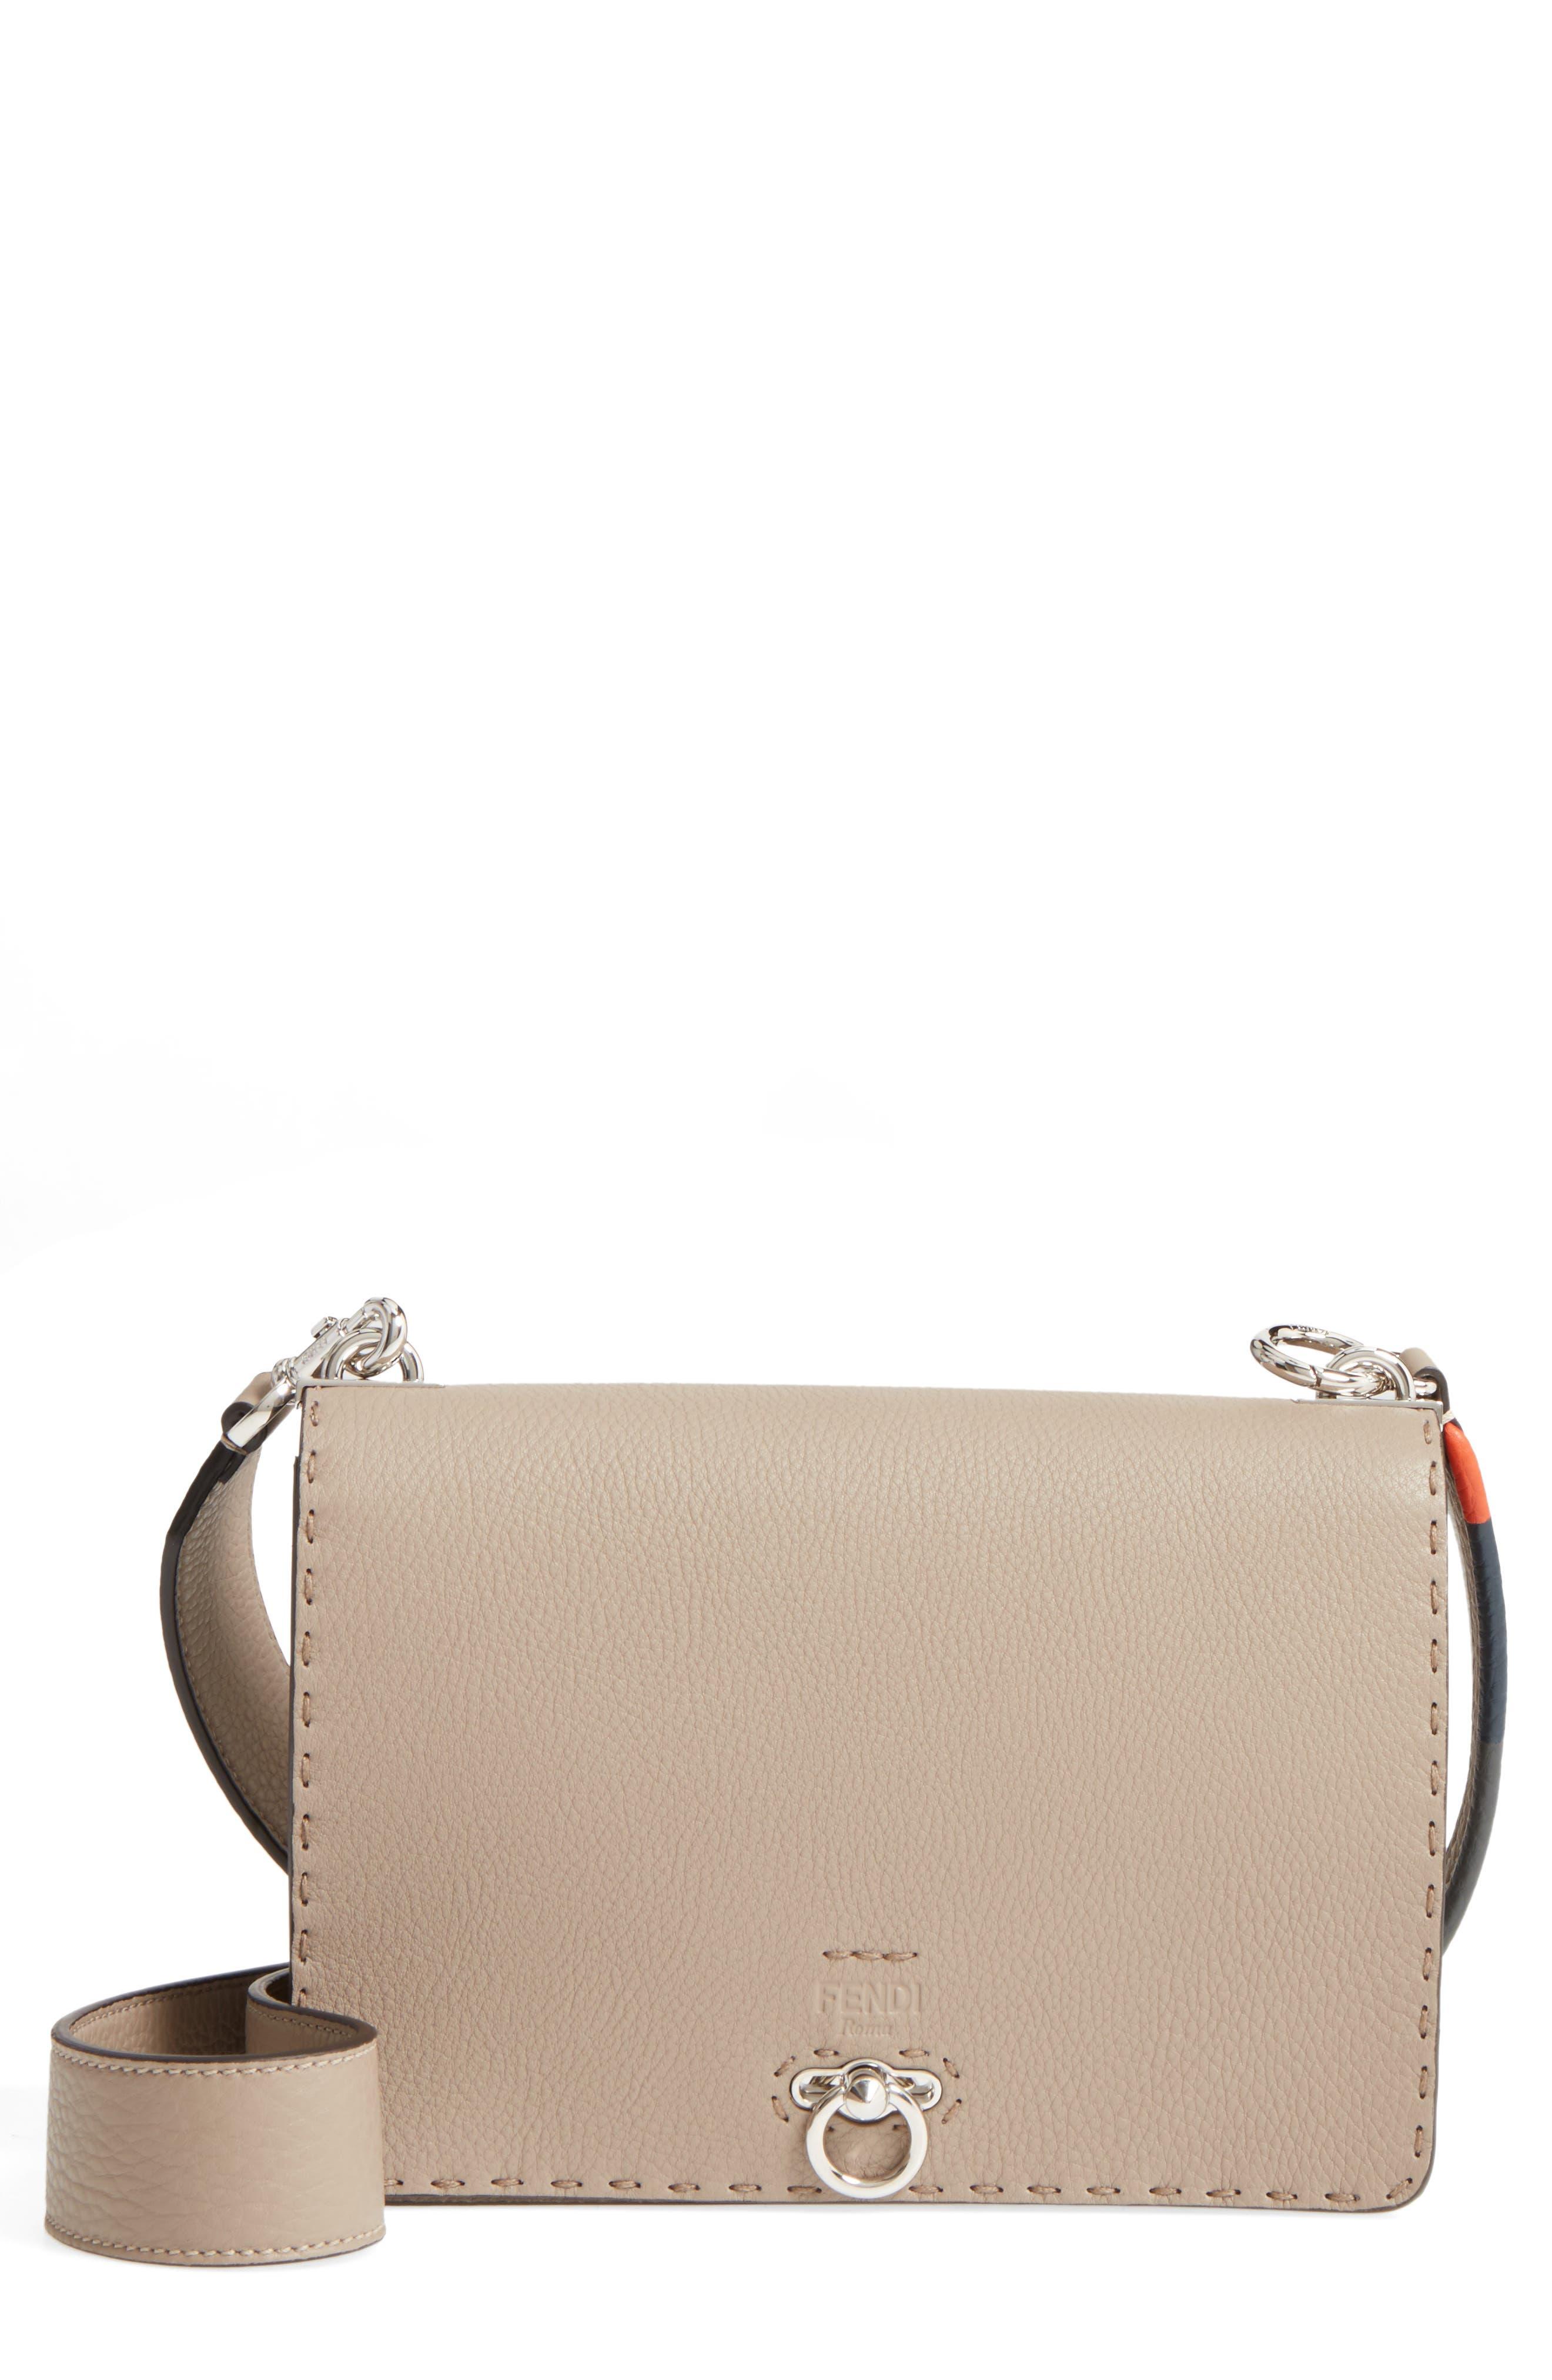 Pebbled Leather Messenger Bag,                         Main,                         color, 250